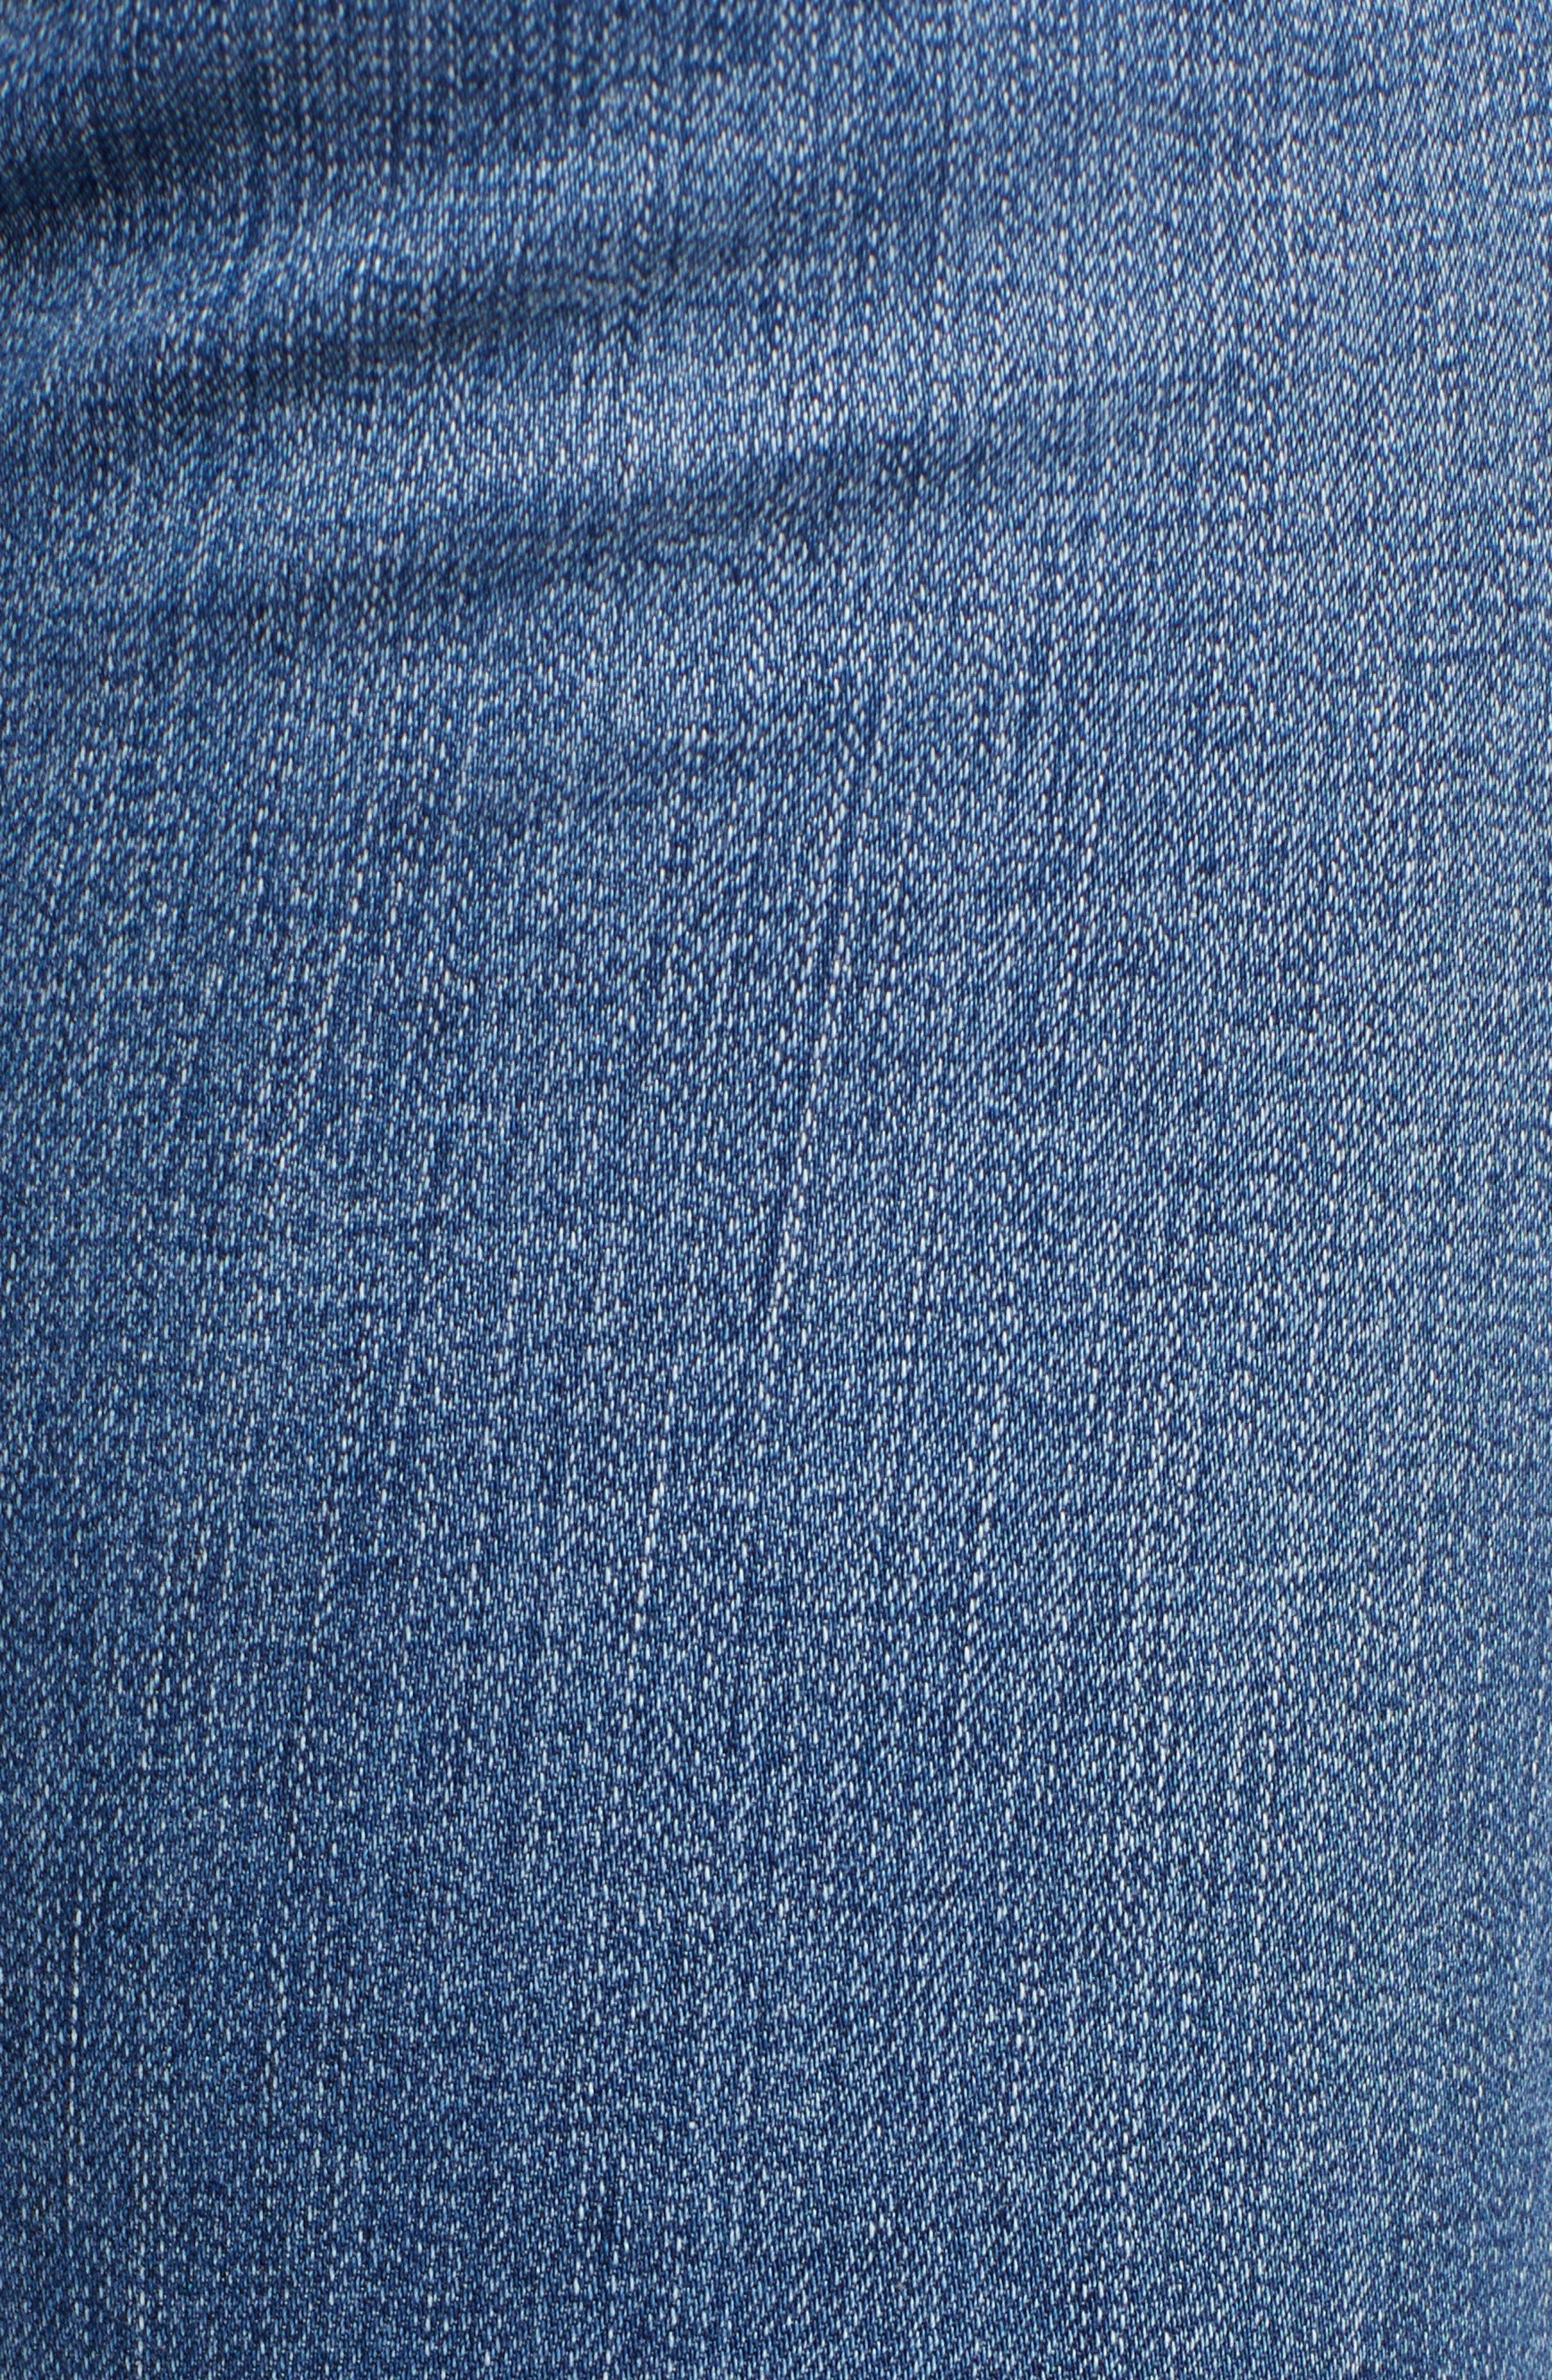 'The Farrah' High Rise Skinny Jeans,                             Alternate thumbnail 45, color,